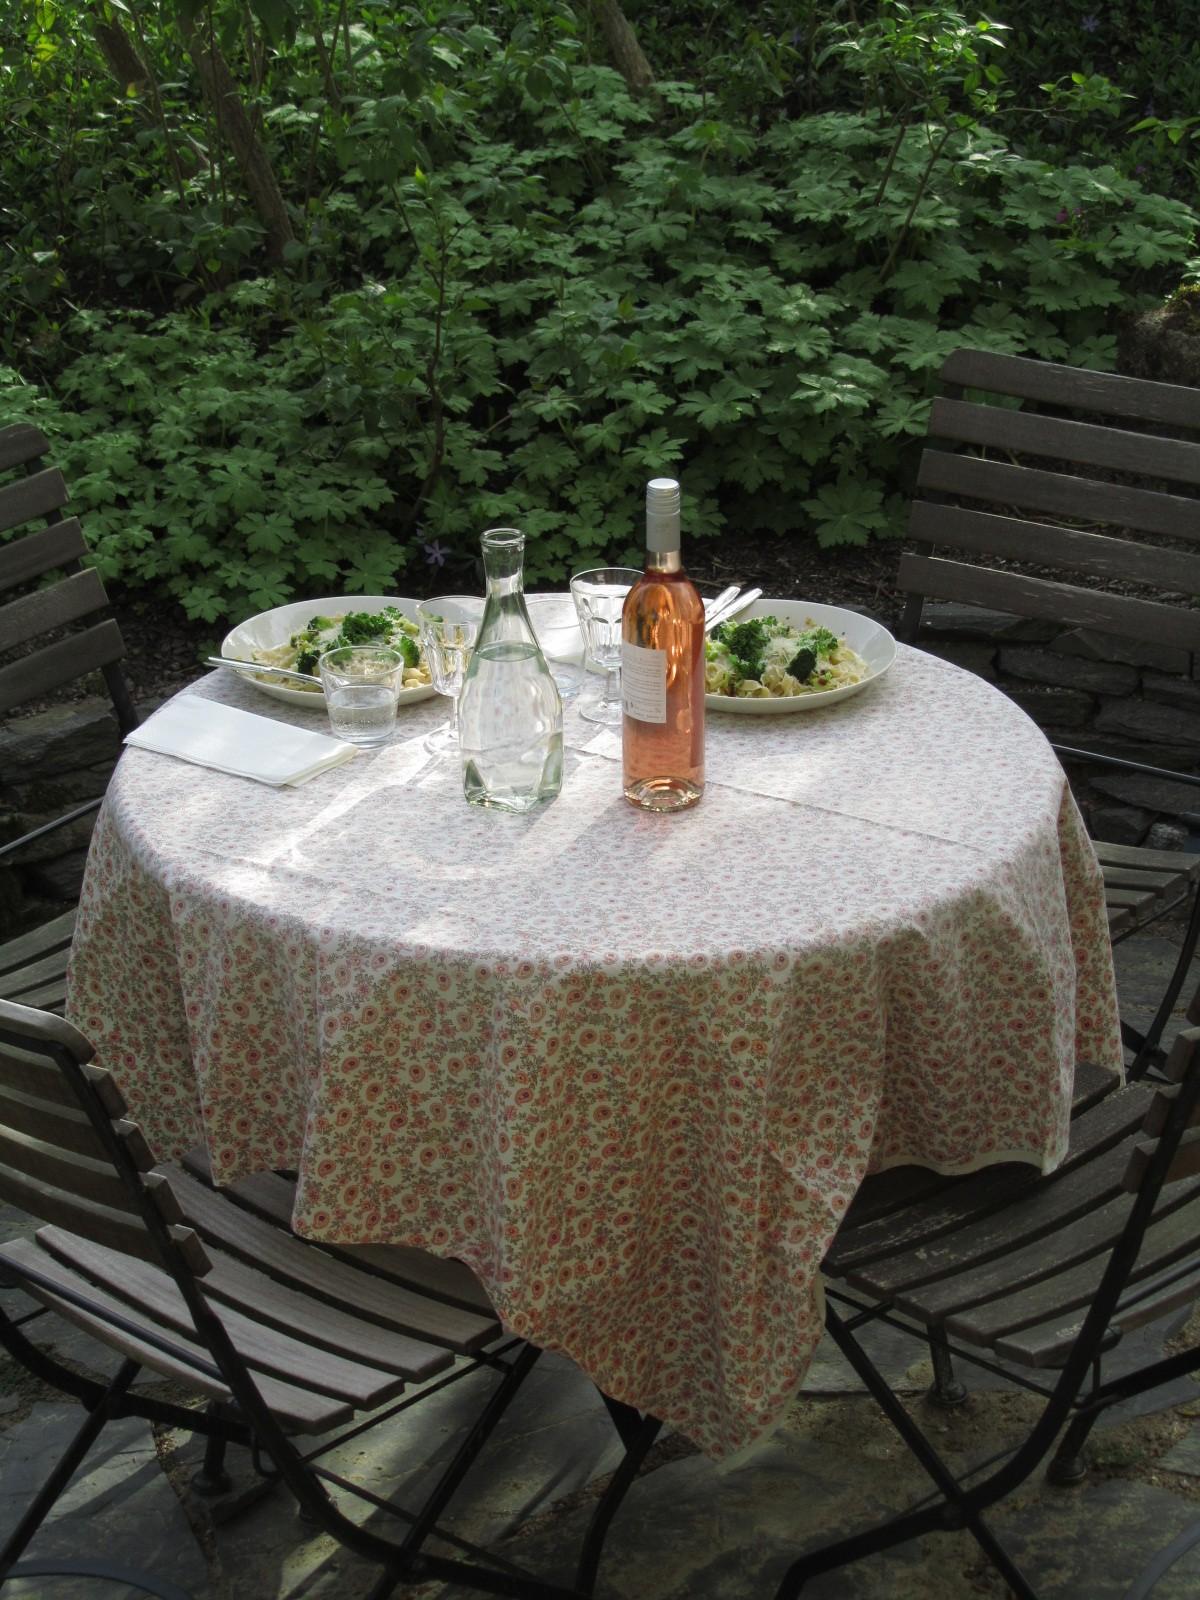 Päivällinen al fresco